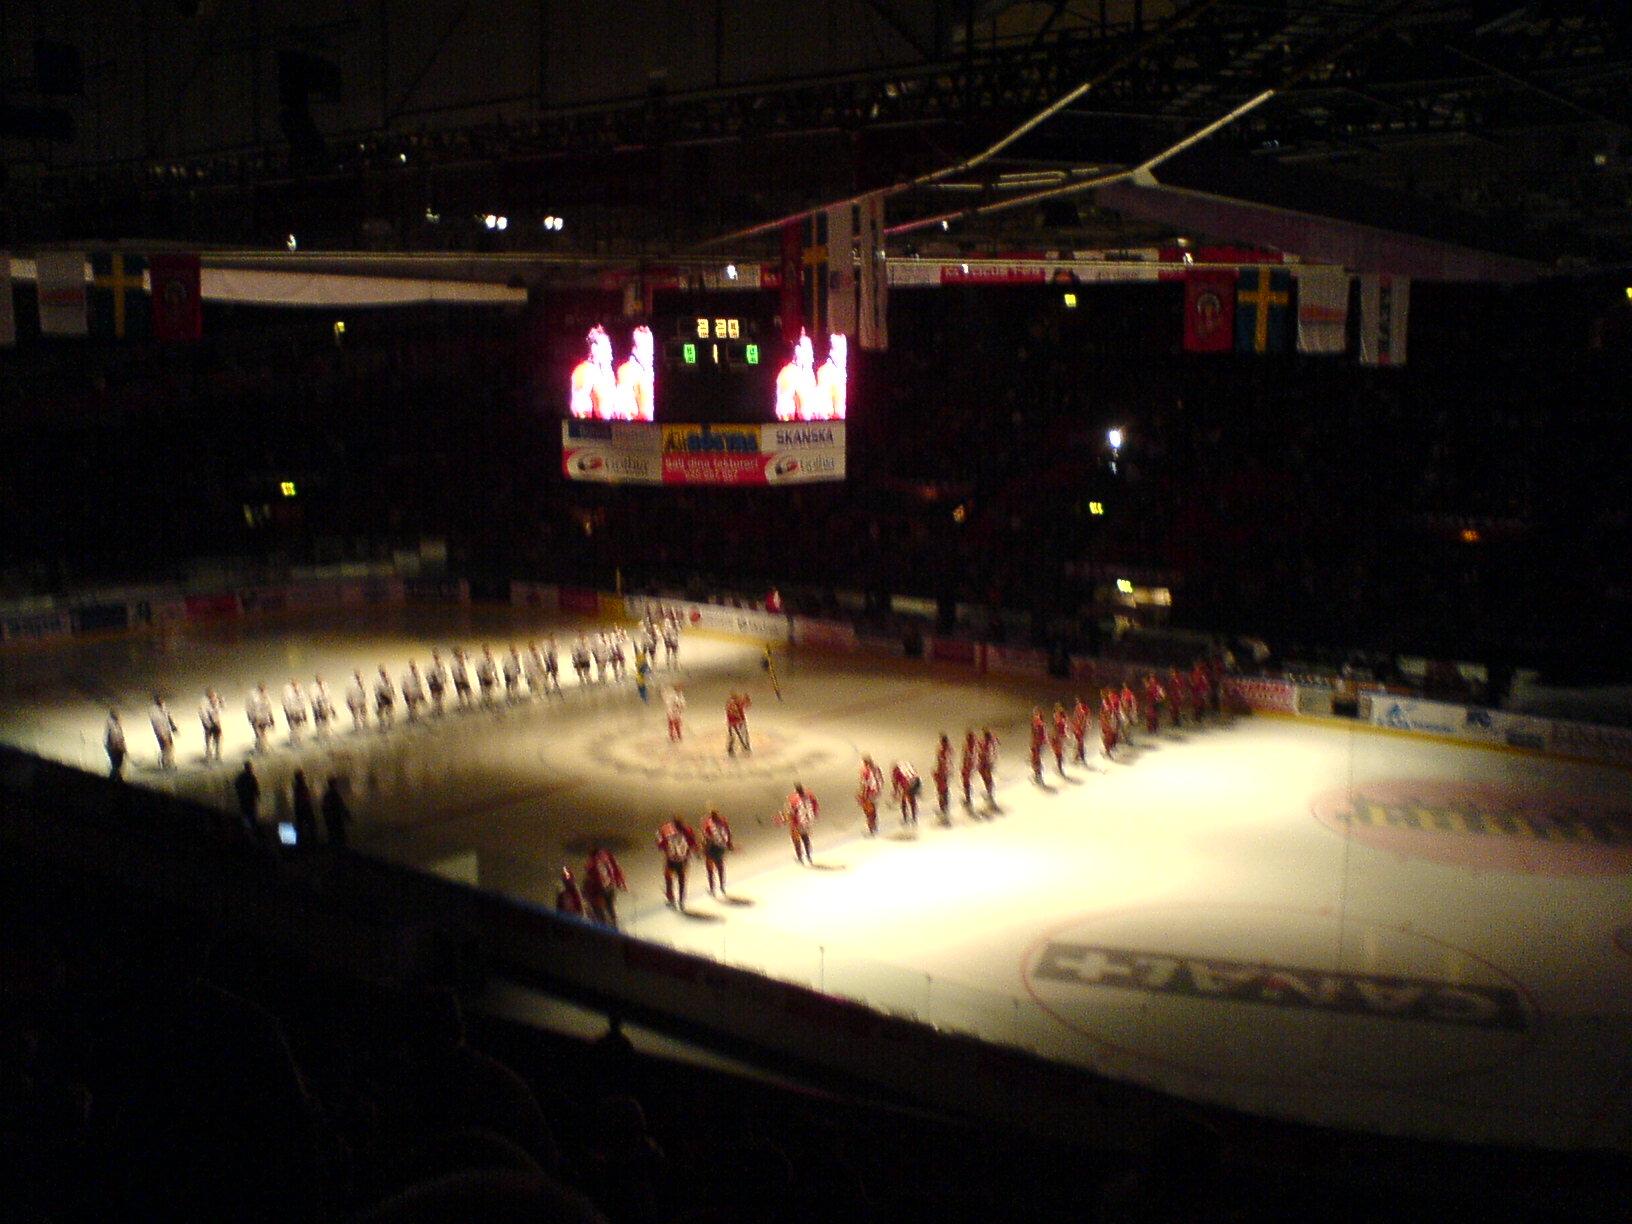 Hockey: Frölunda - Lule, 8-2